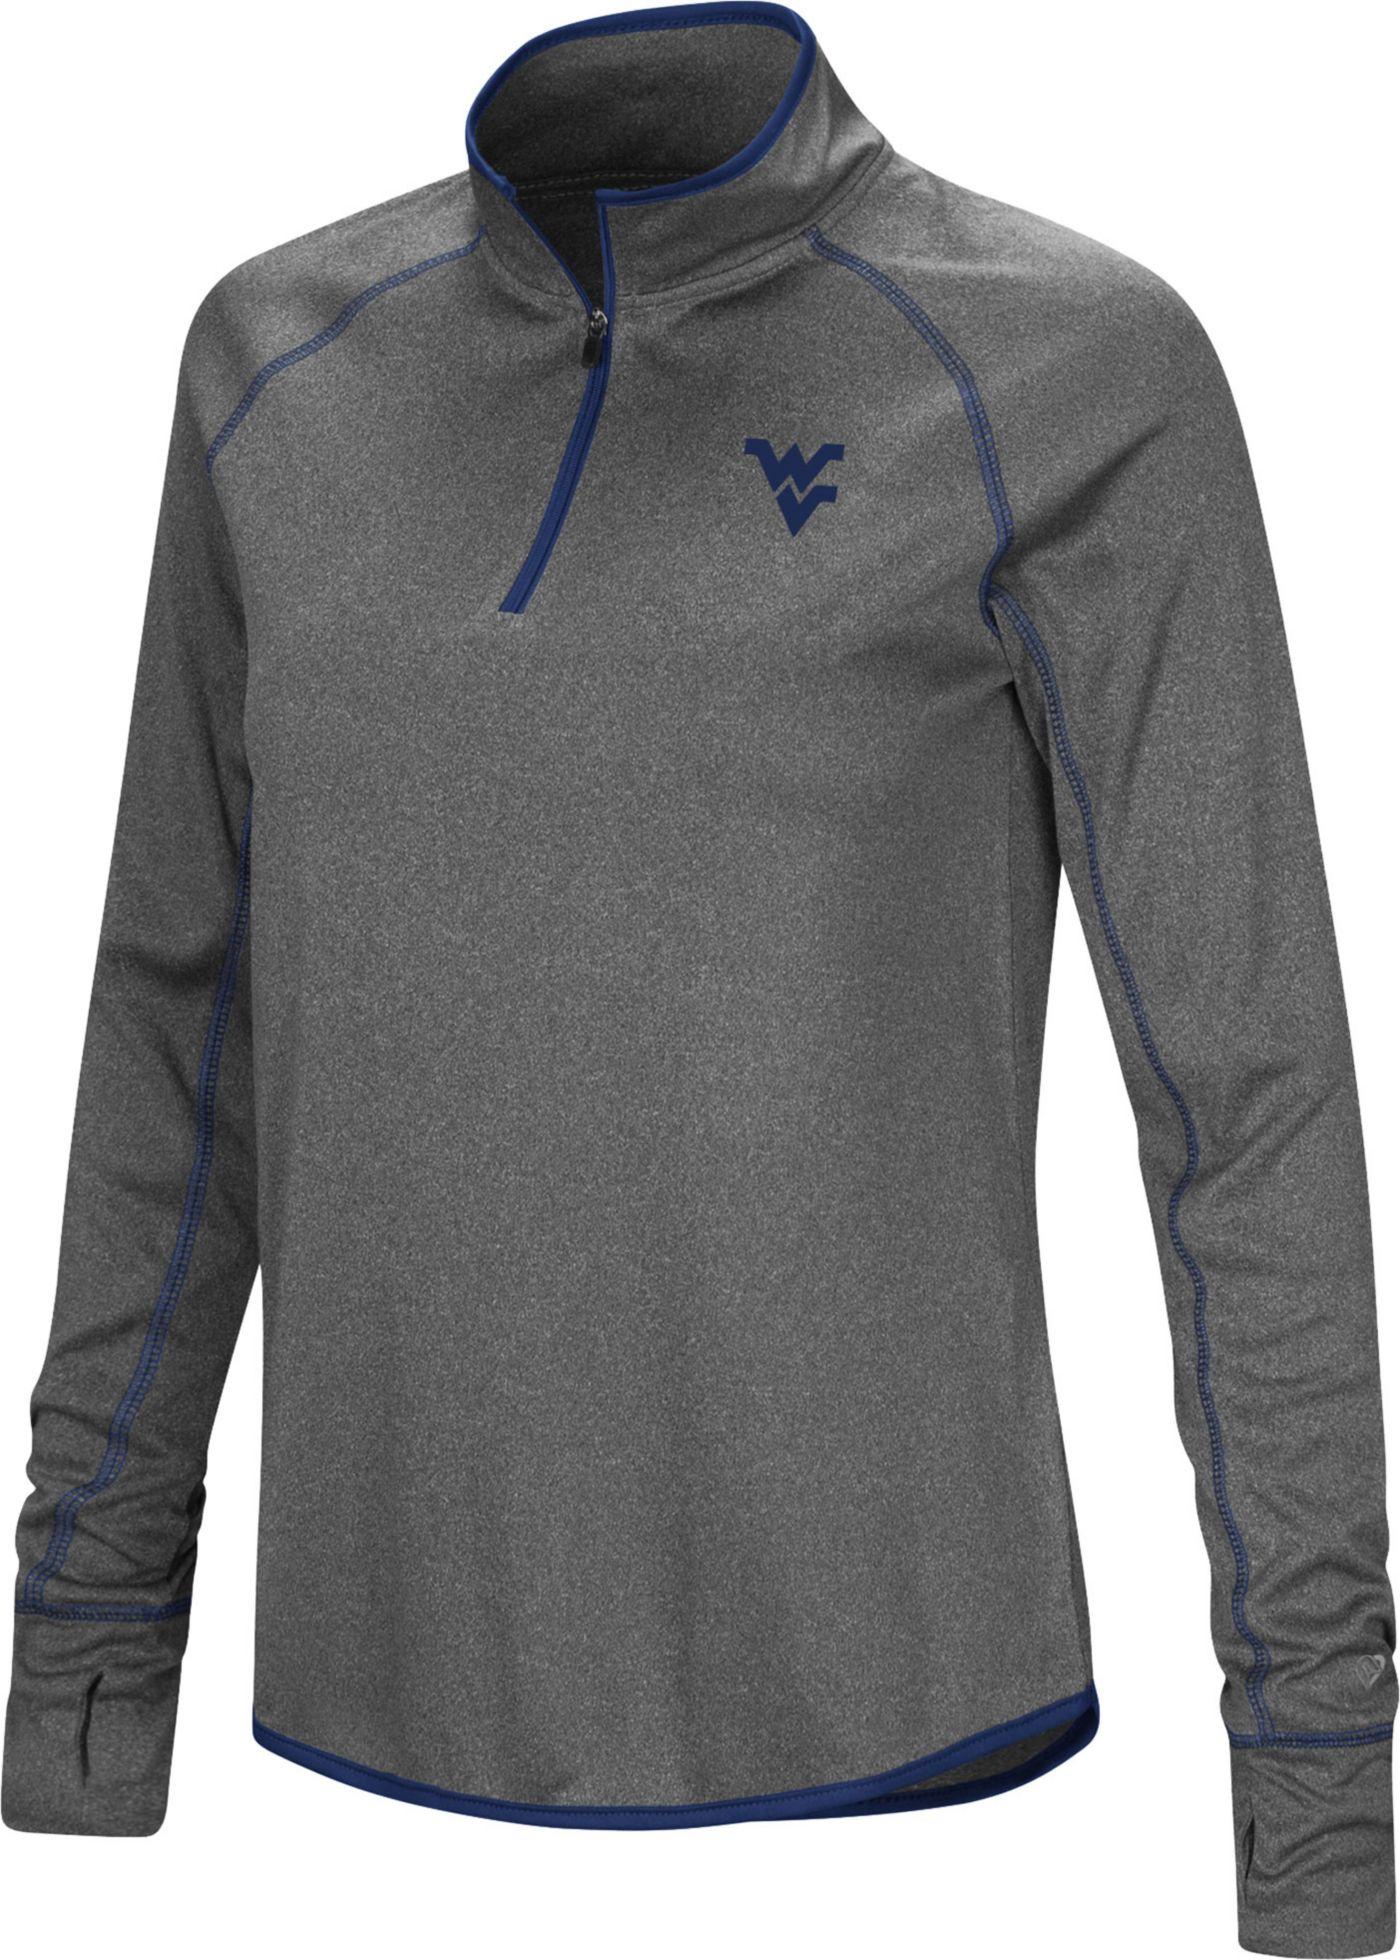 Colosseum Women's West Virginia Mountaineers Grey Stingray Quarter-Zip Shirt